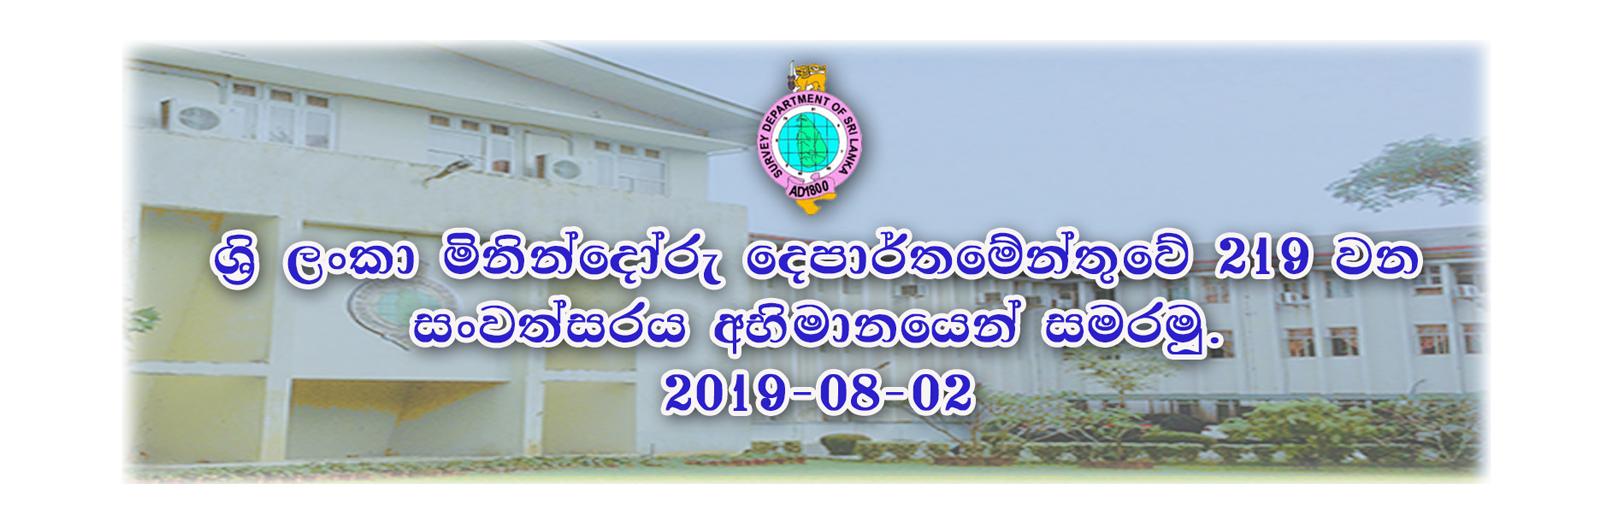 Survey Department of SriLanka